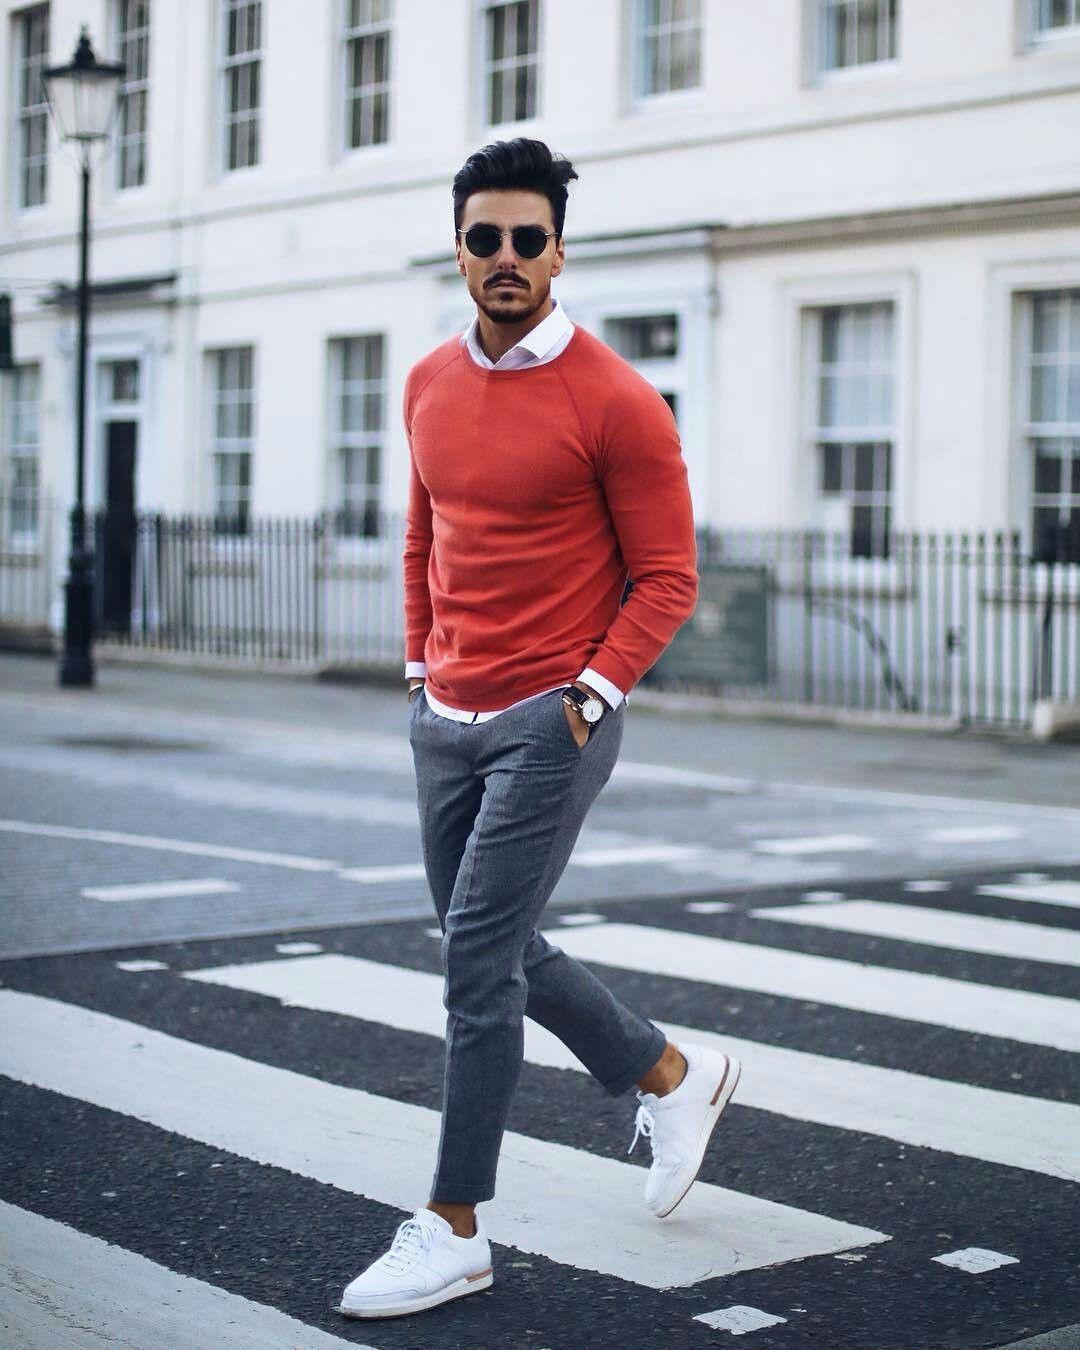 54c6d3ffa59 Men style fashion look clothing clothes man ropa moda para hombres outfit  models moda masculina urbano urban estilo street